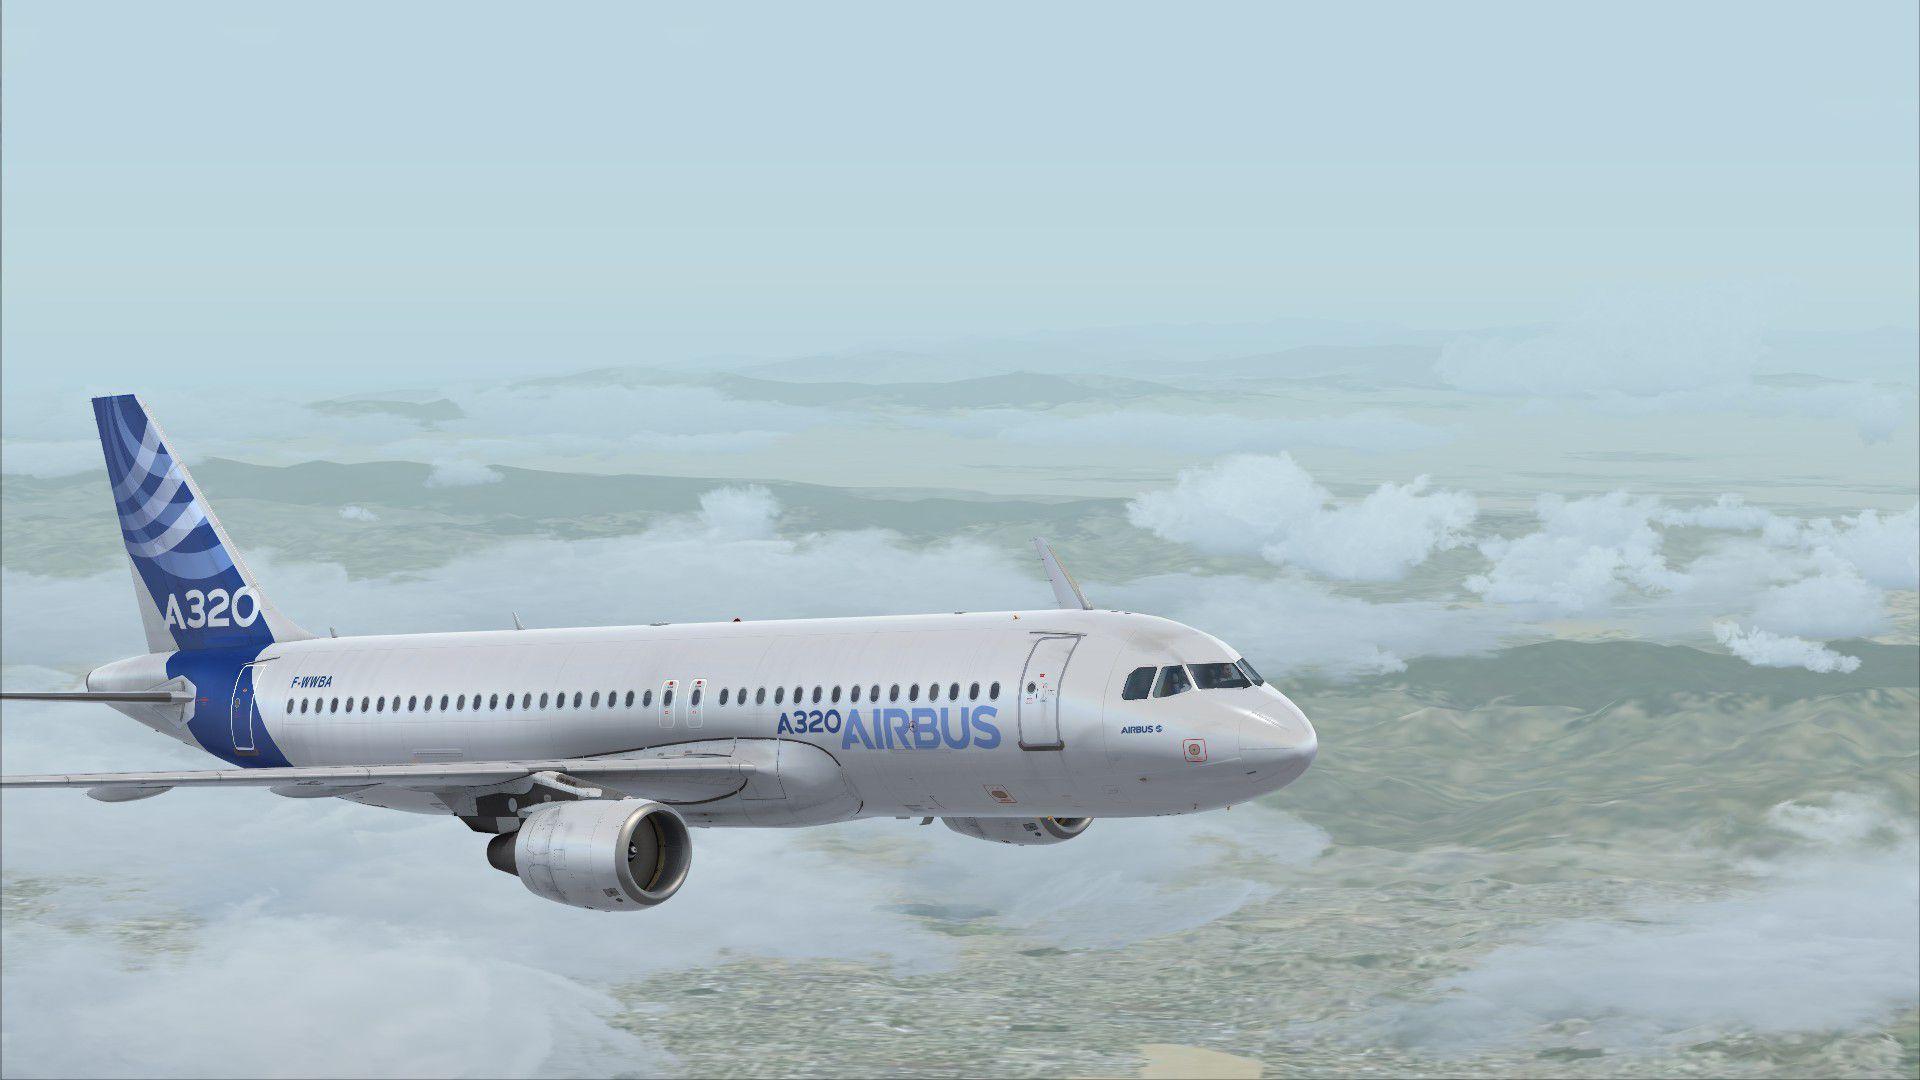 A3202